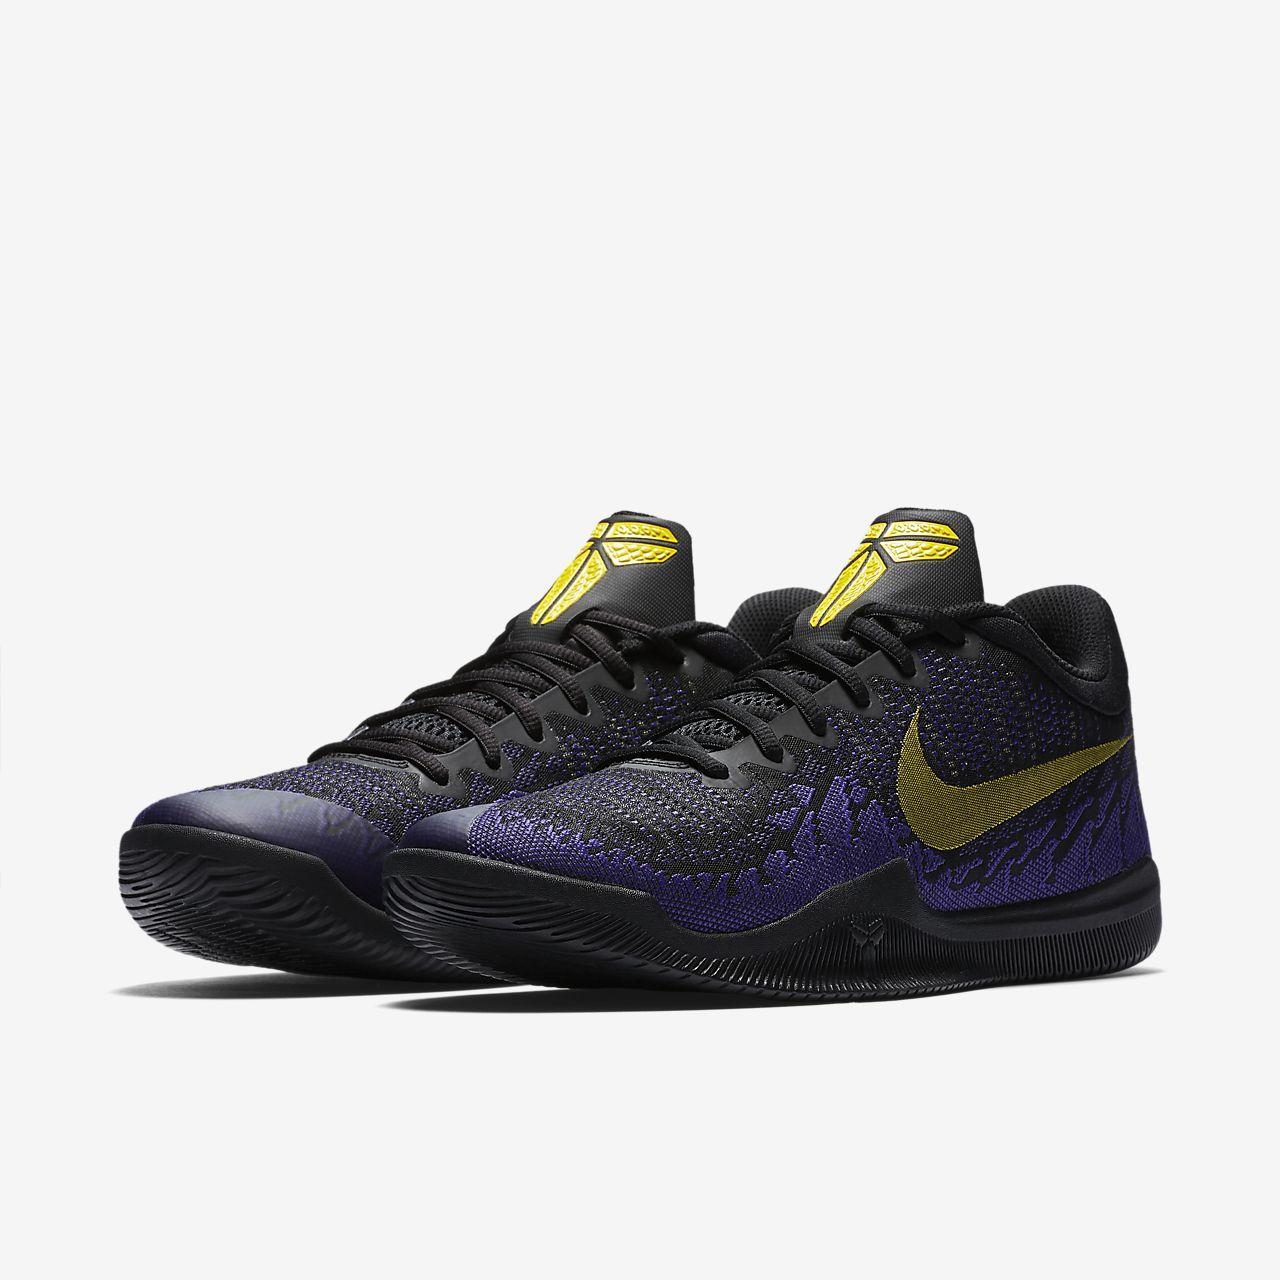 nike air kobe bryant shoes mens basketball trainers